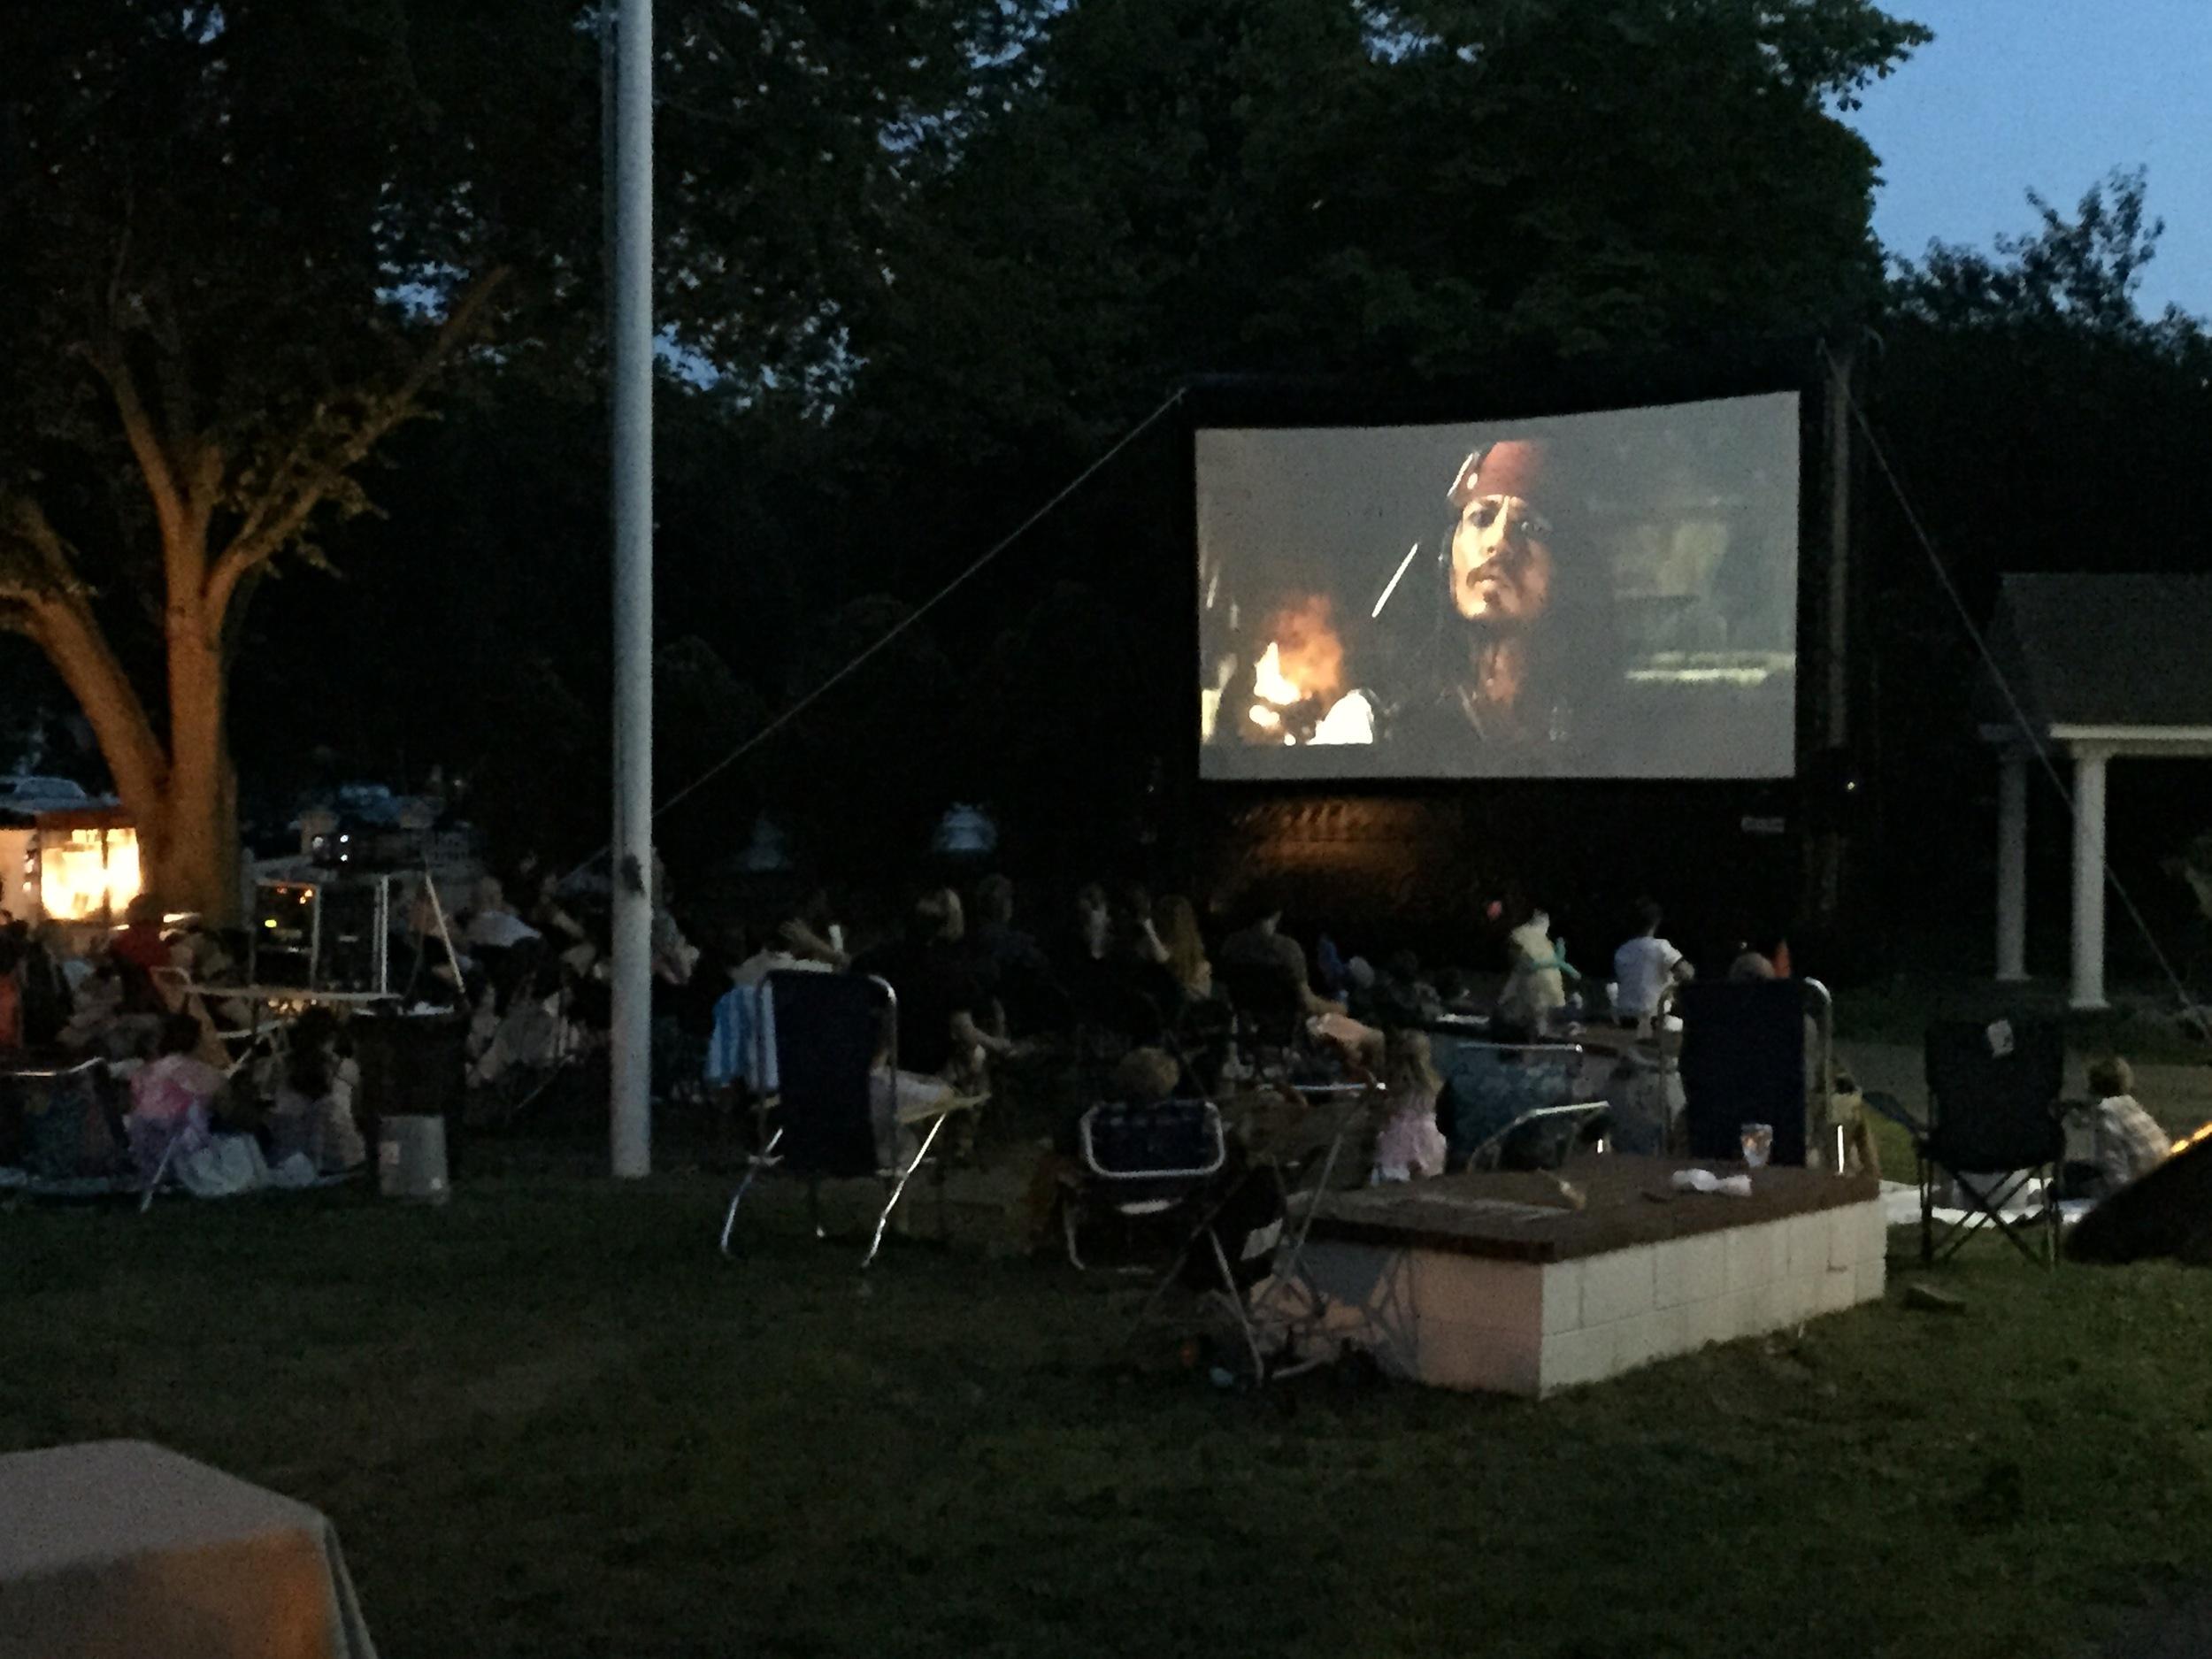 Pirates of the Caribbean screening at Family Night!